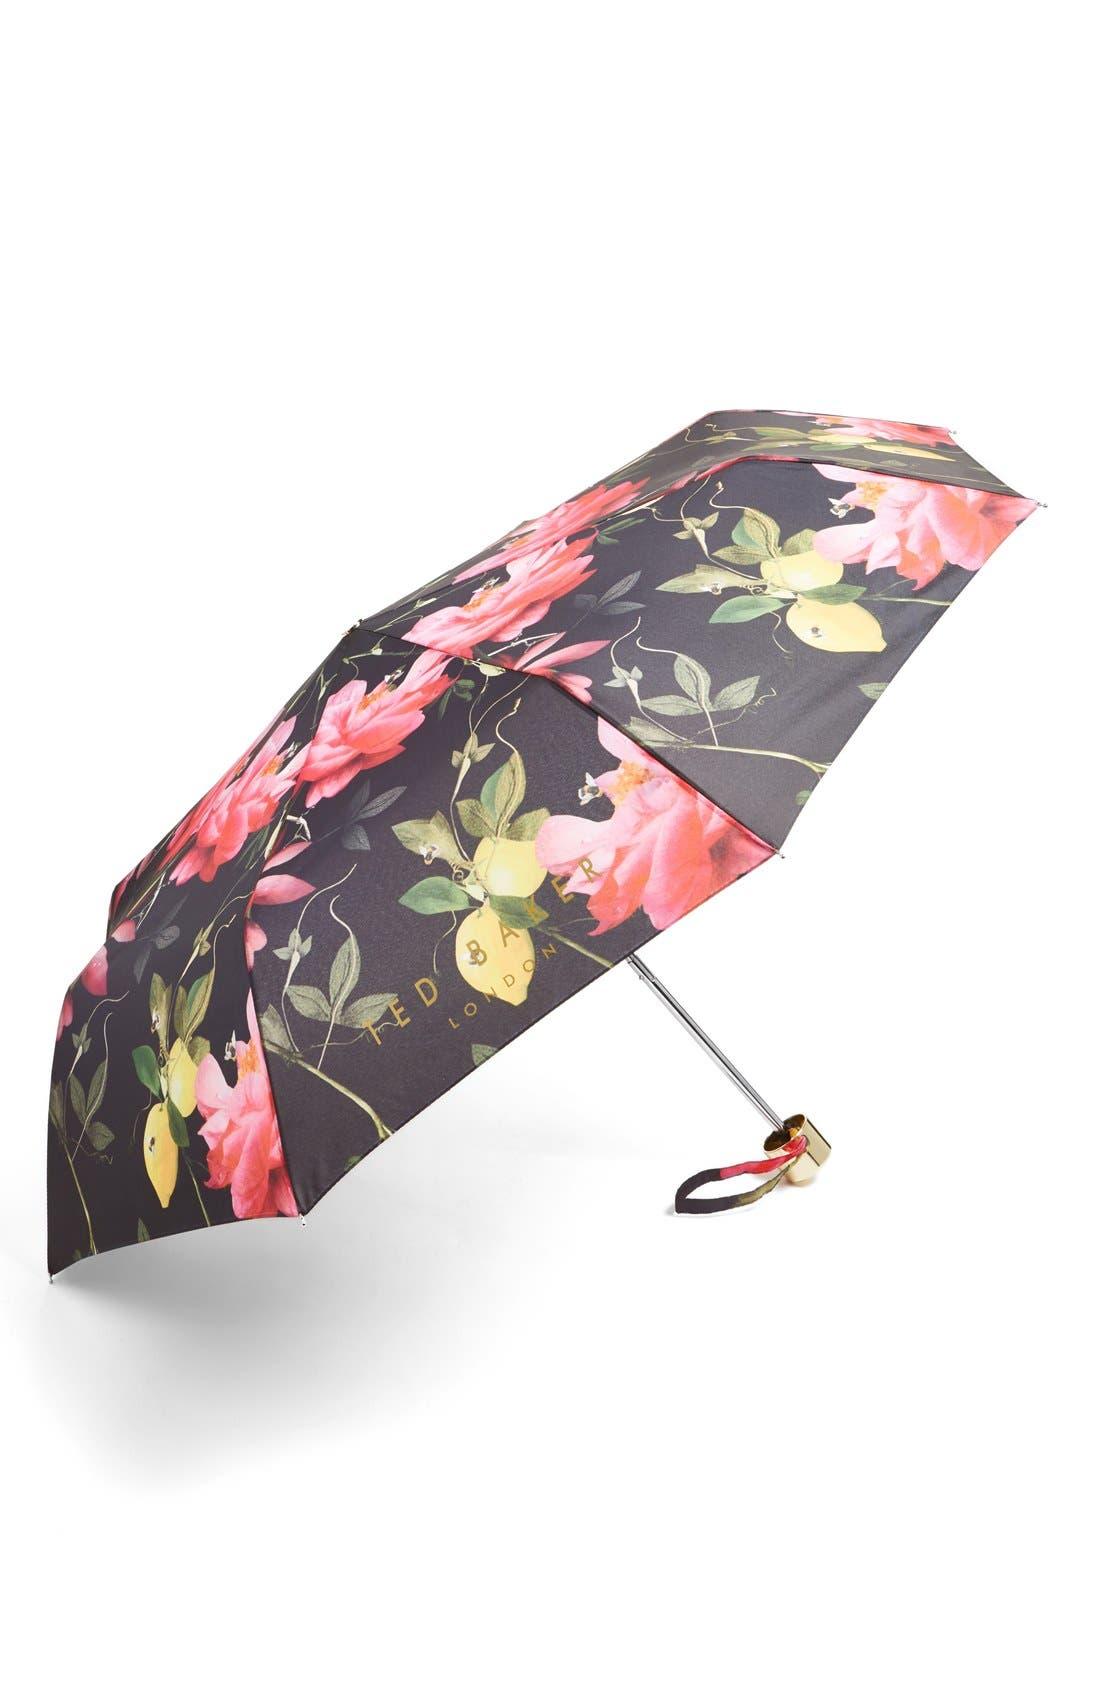 Alternate Image 1 Selected - Ted Baker London 'Citrus Bloom' Umbrella